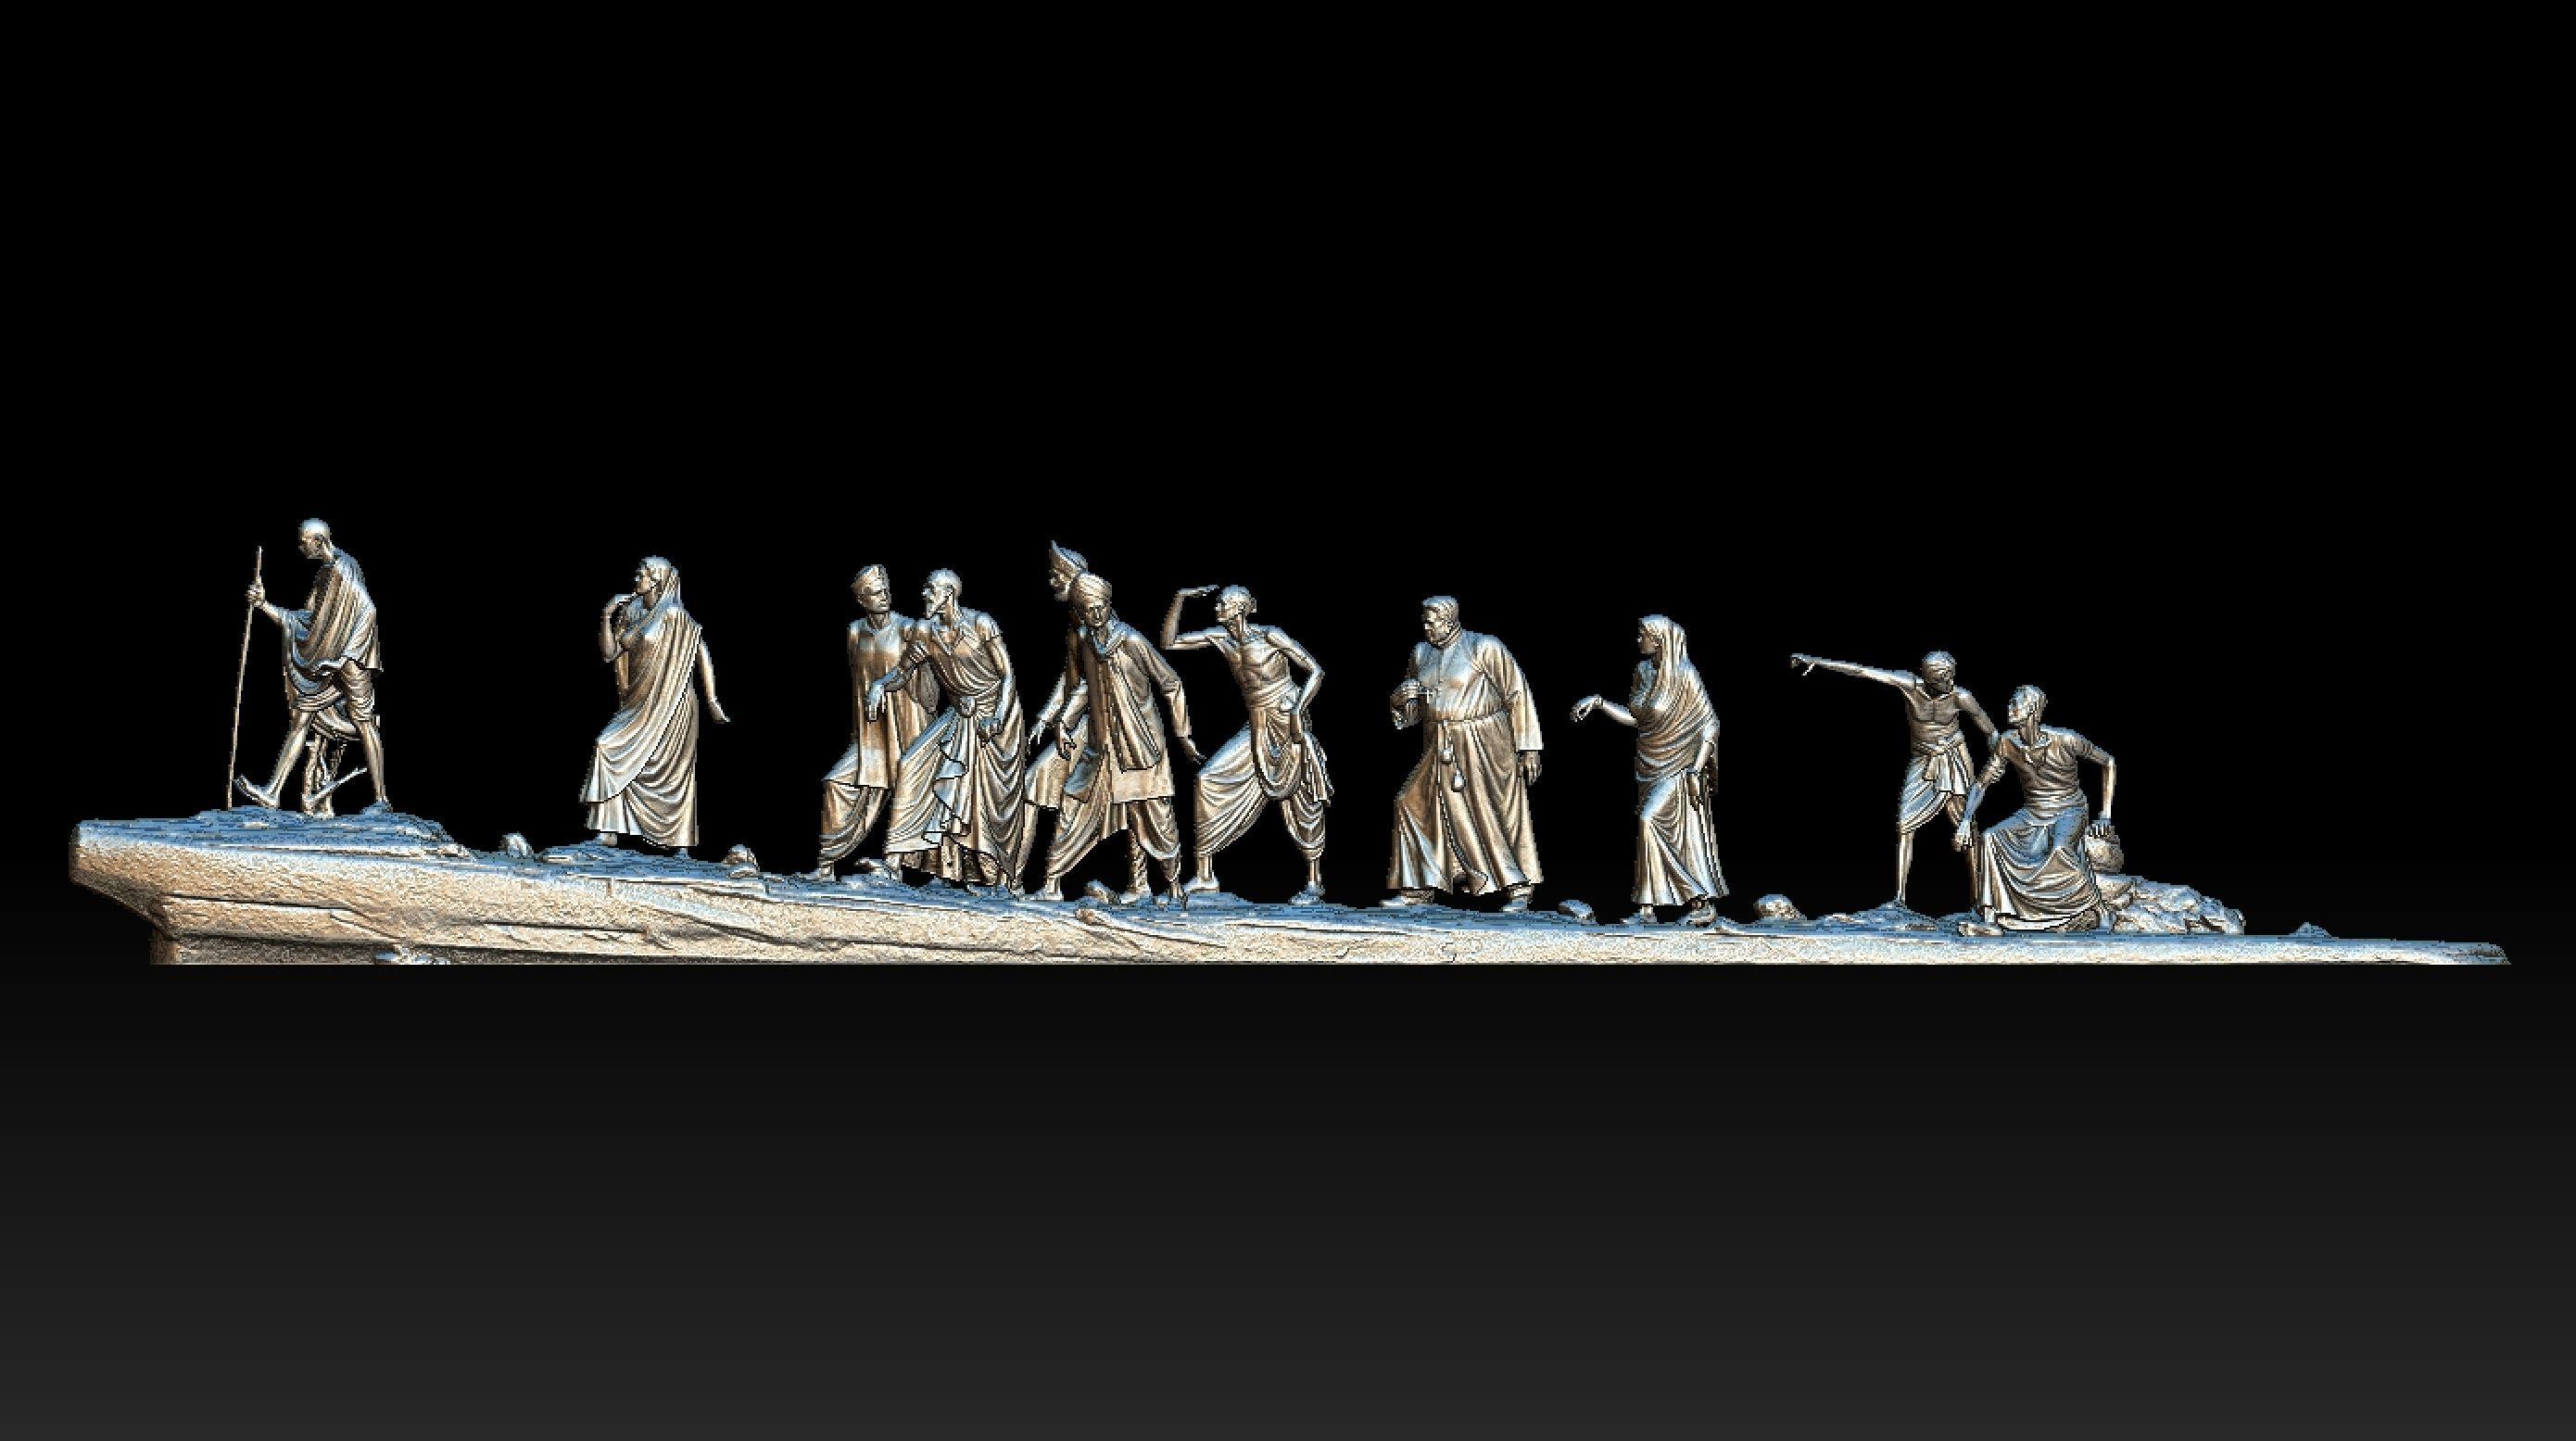 Gandhi Salt March 3DP